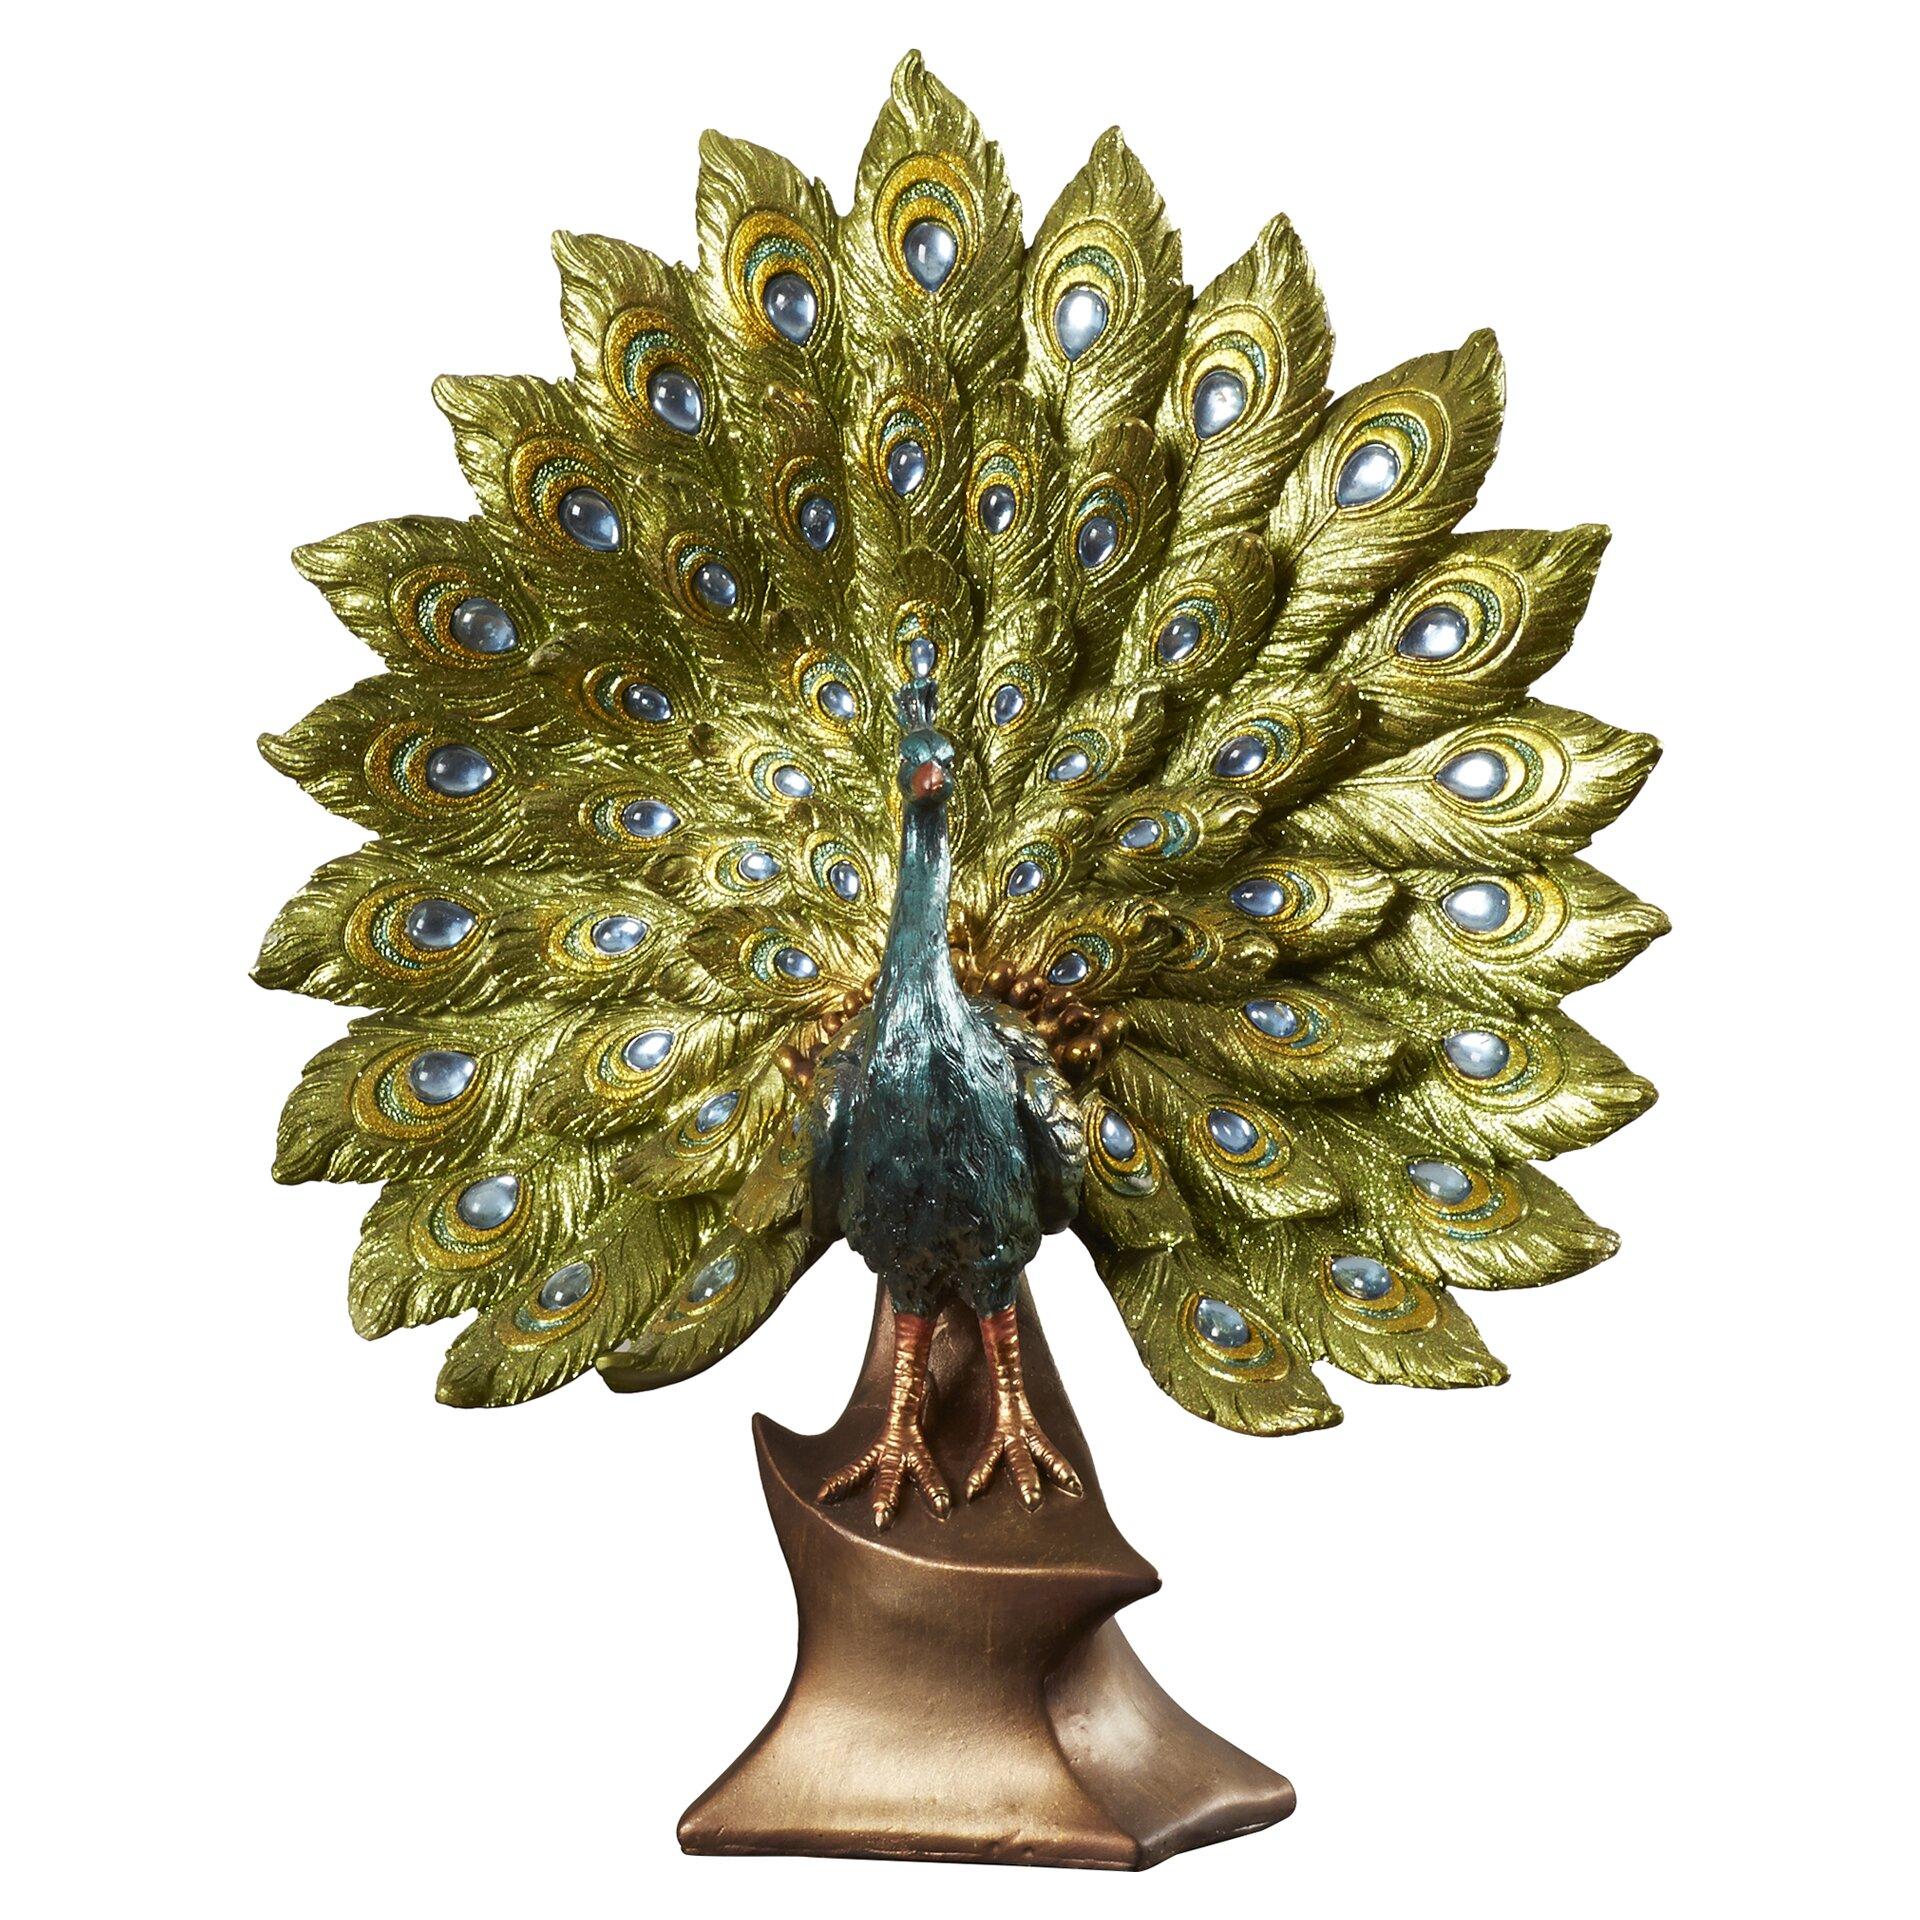 World Menagerie Peacock Decor Figurine Reviews Wayfair